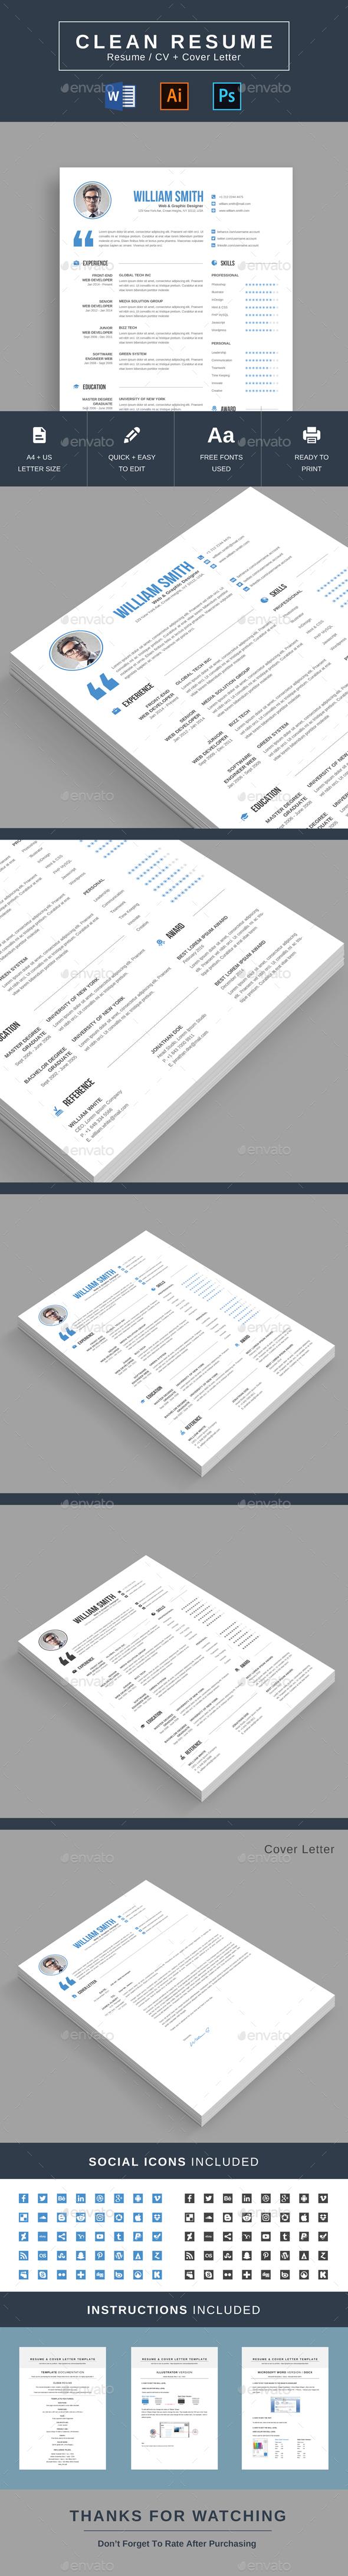 GraphicRiver Clean Resume 21120130